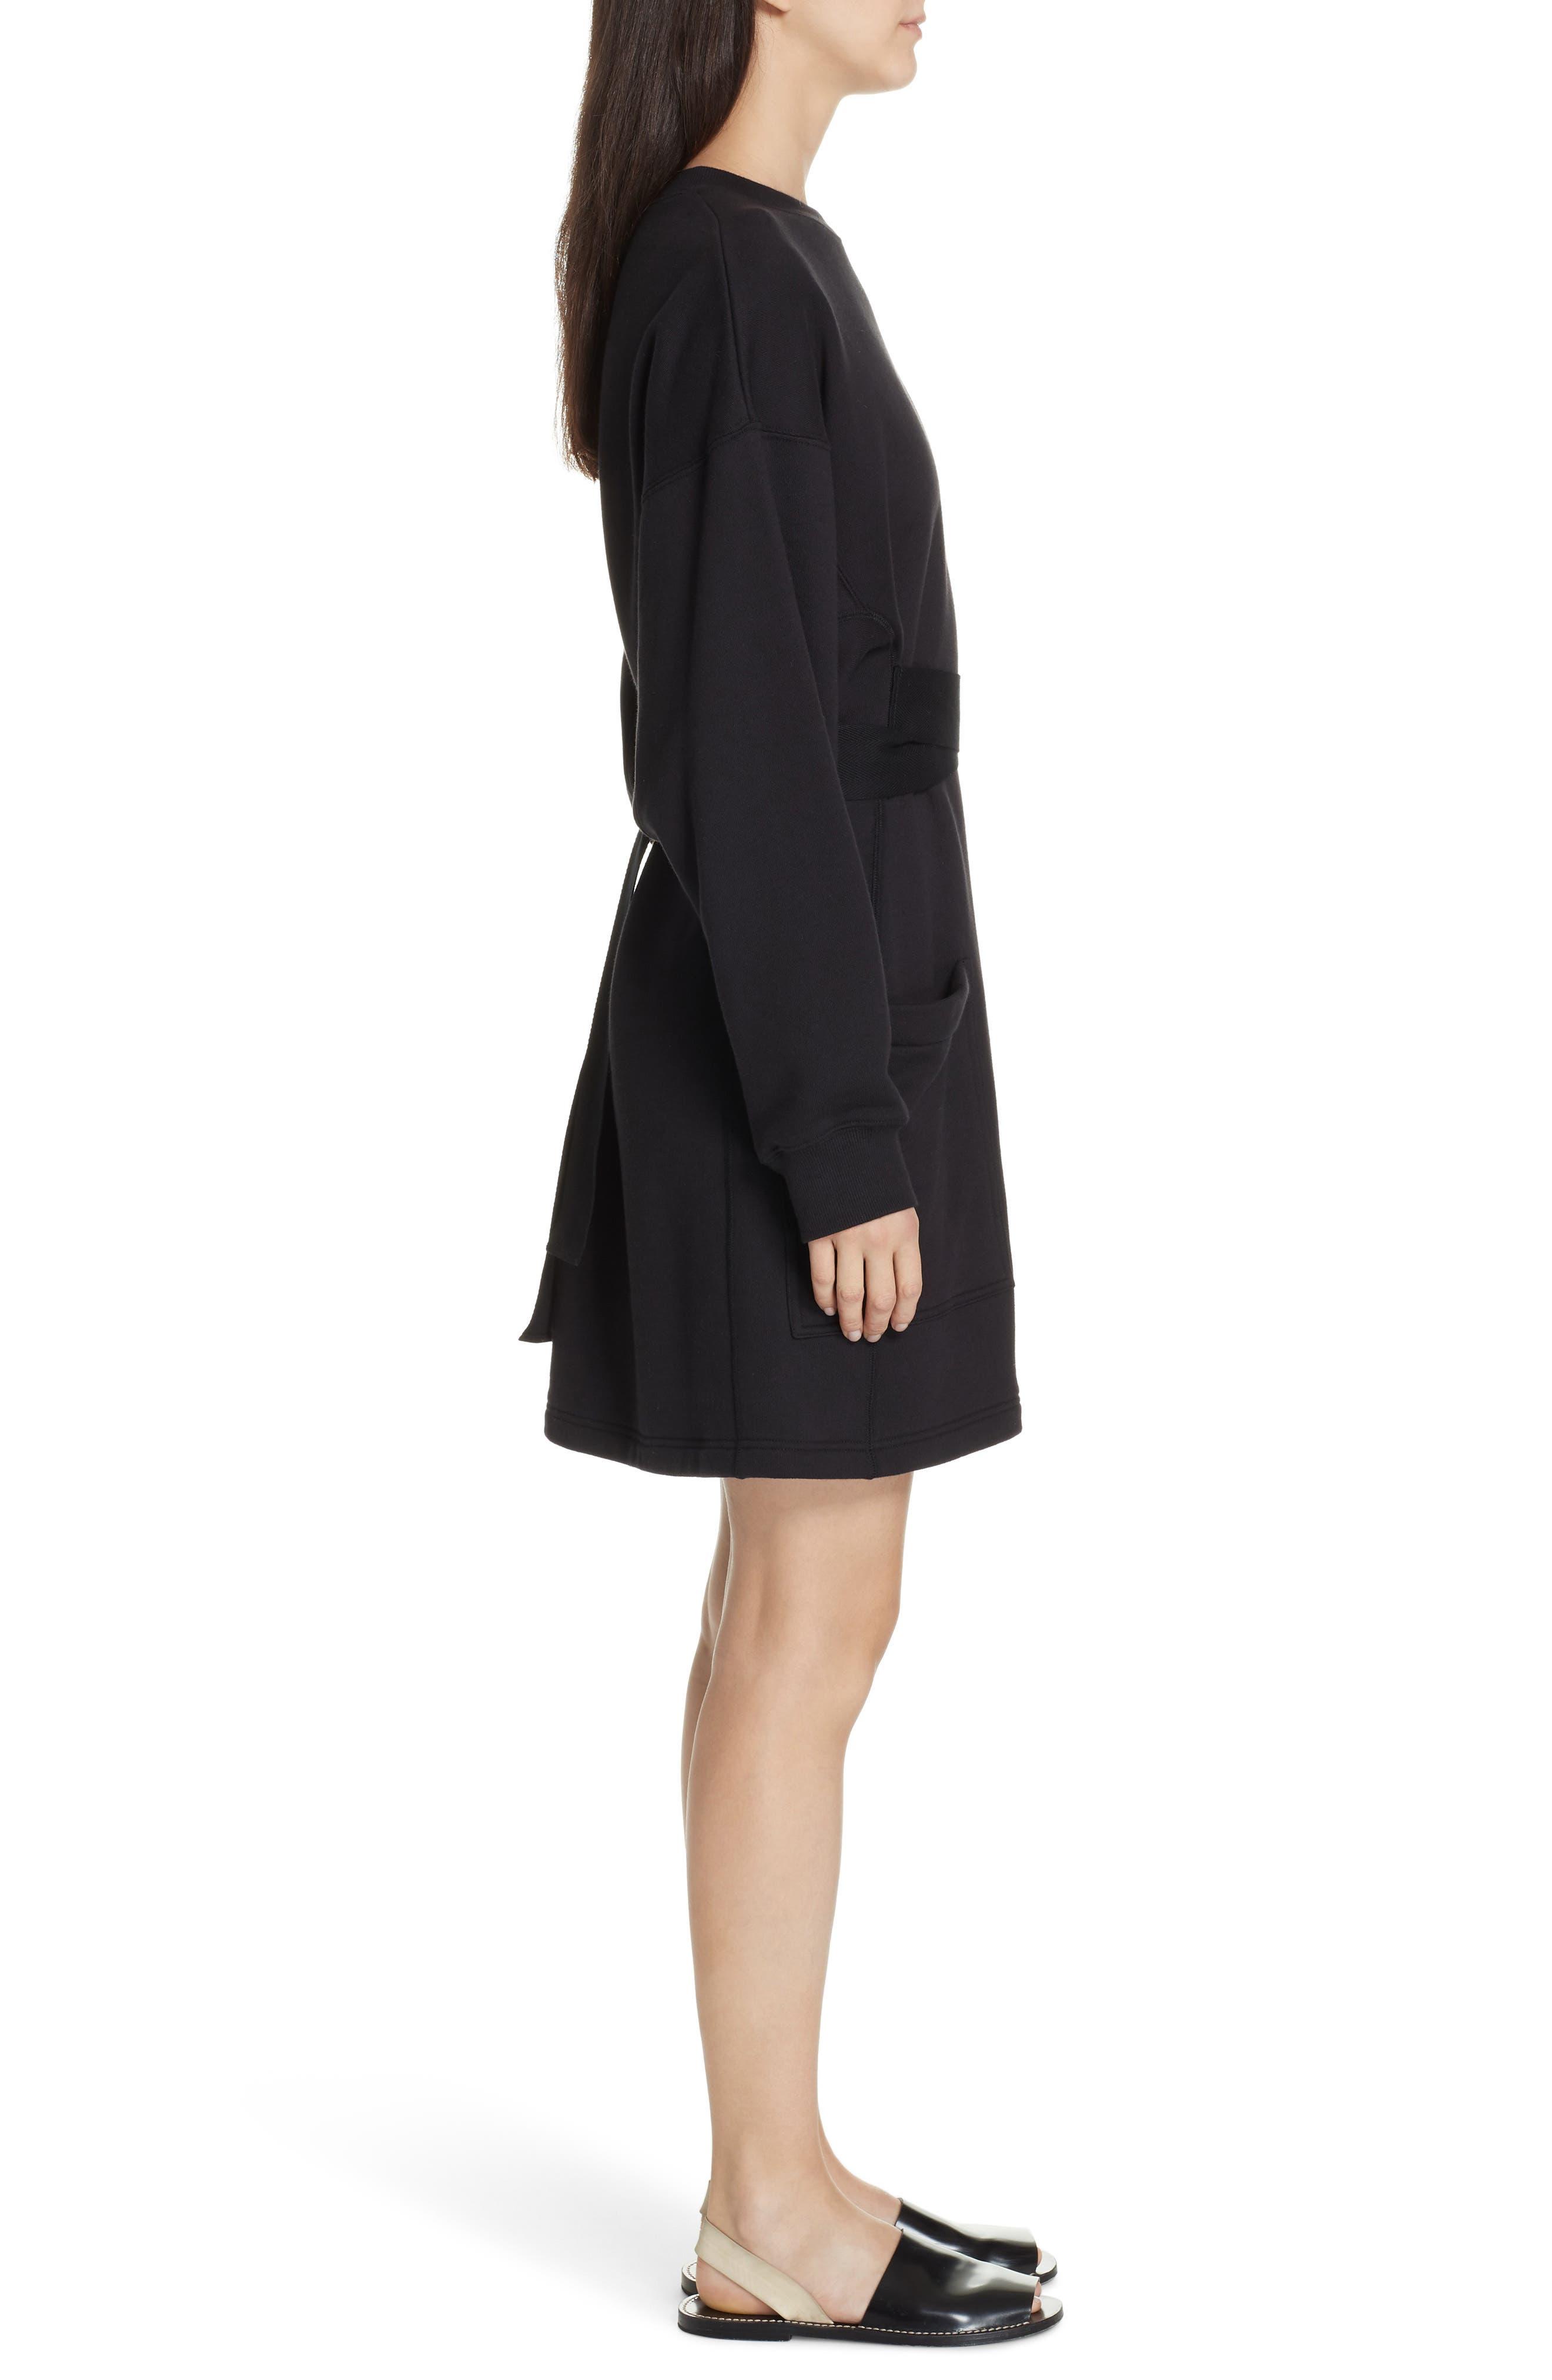 PSWL Belted Sweatshirt Dress,                             Alternate thumbnail 3, color,                             BLACK